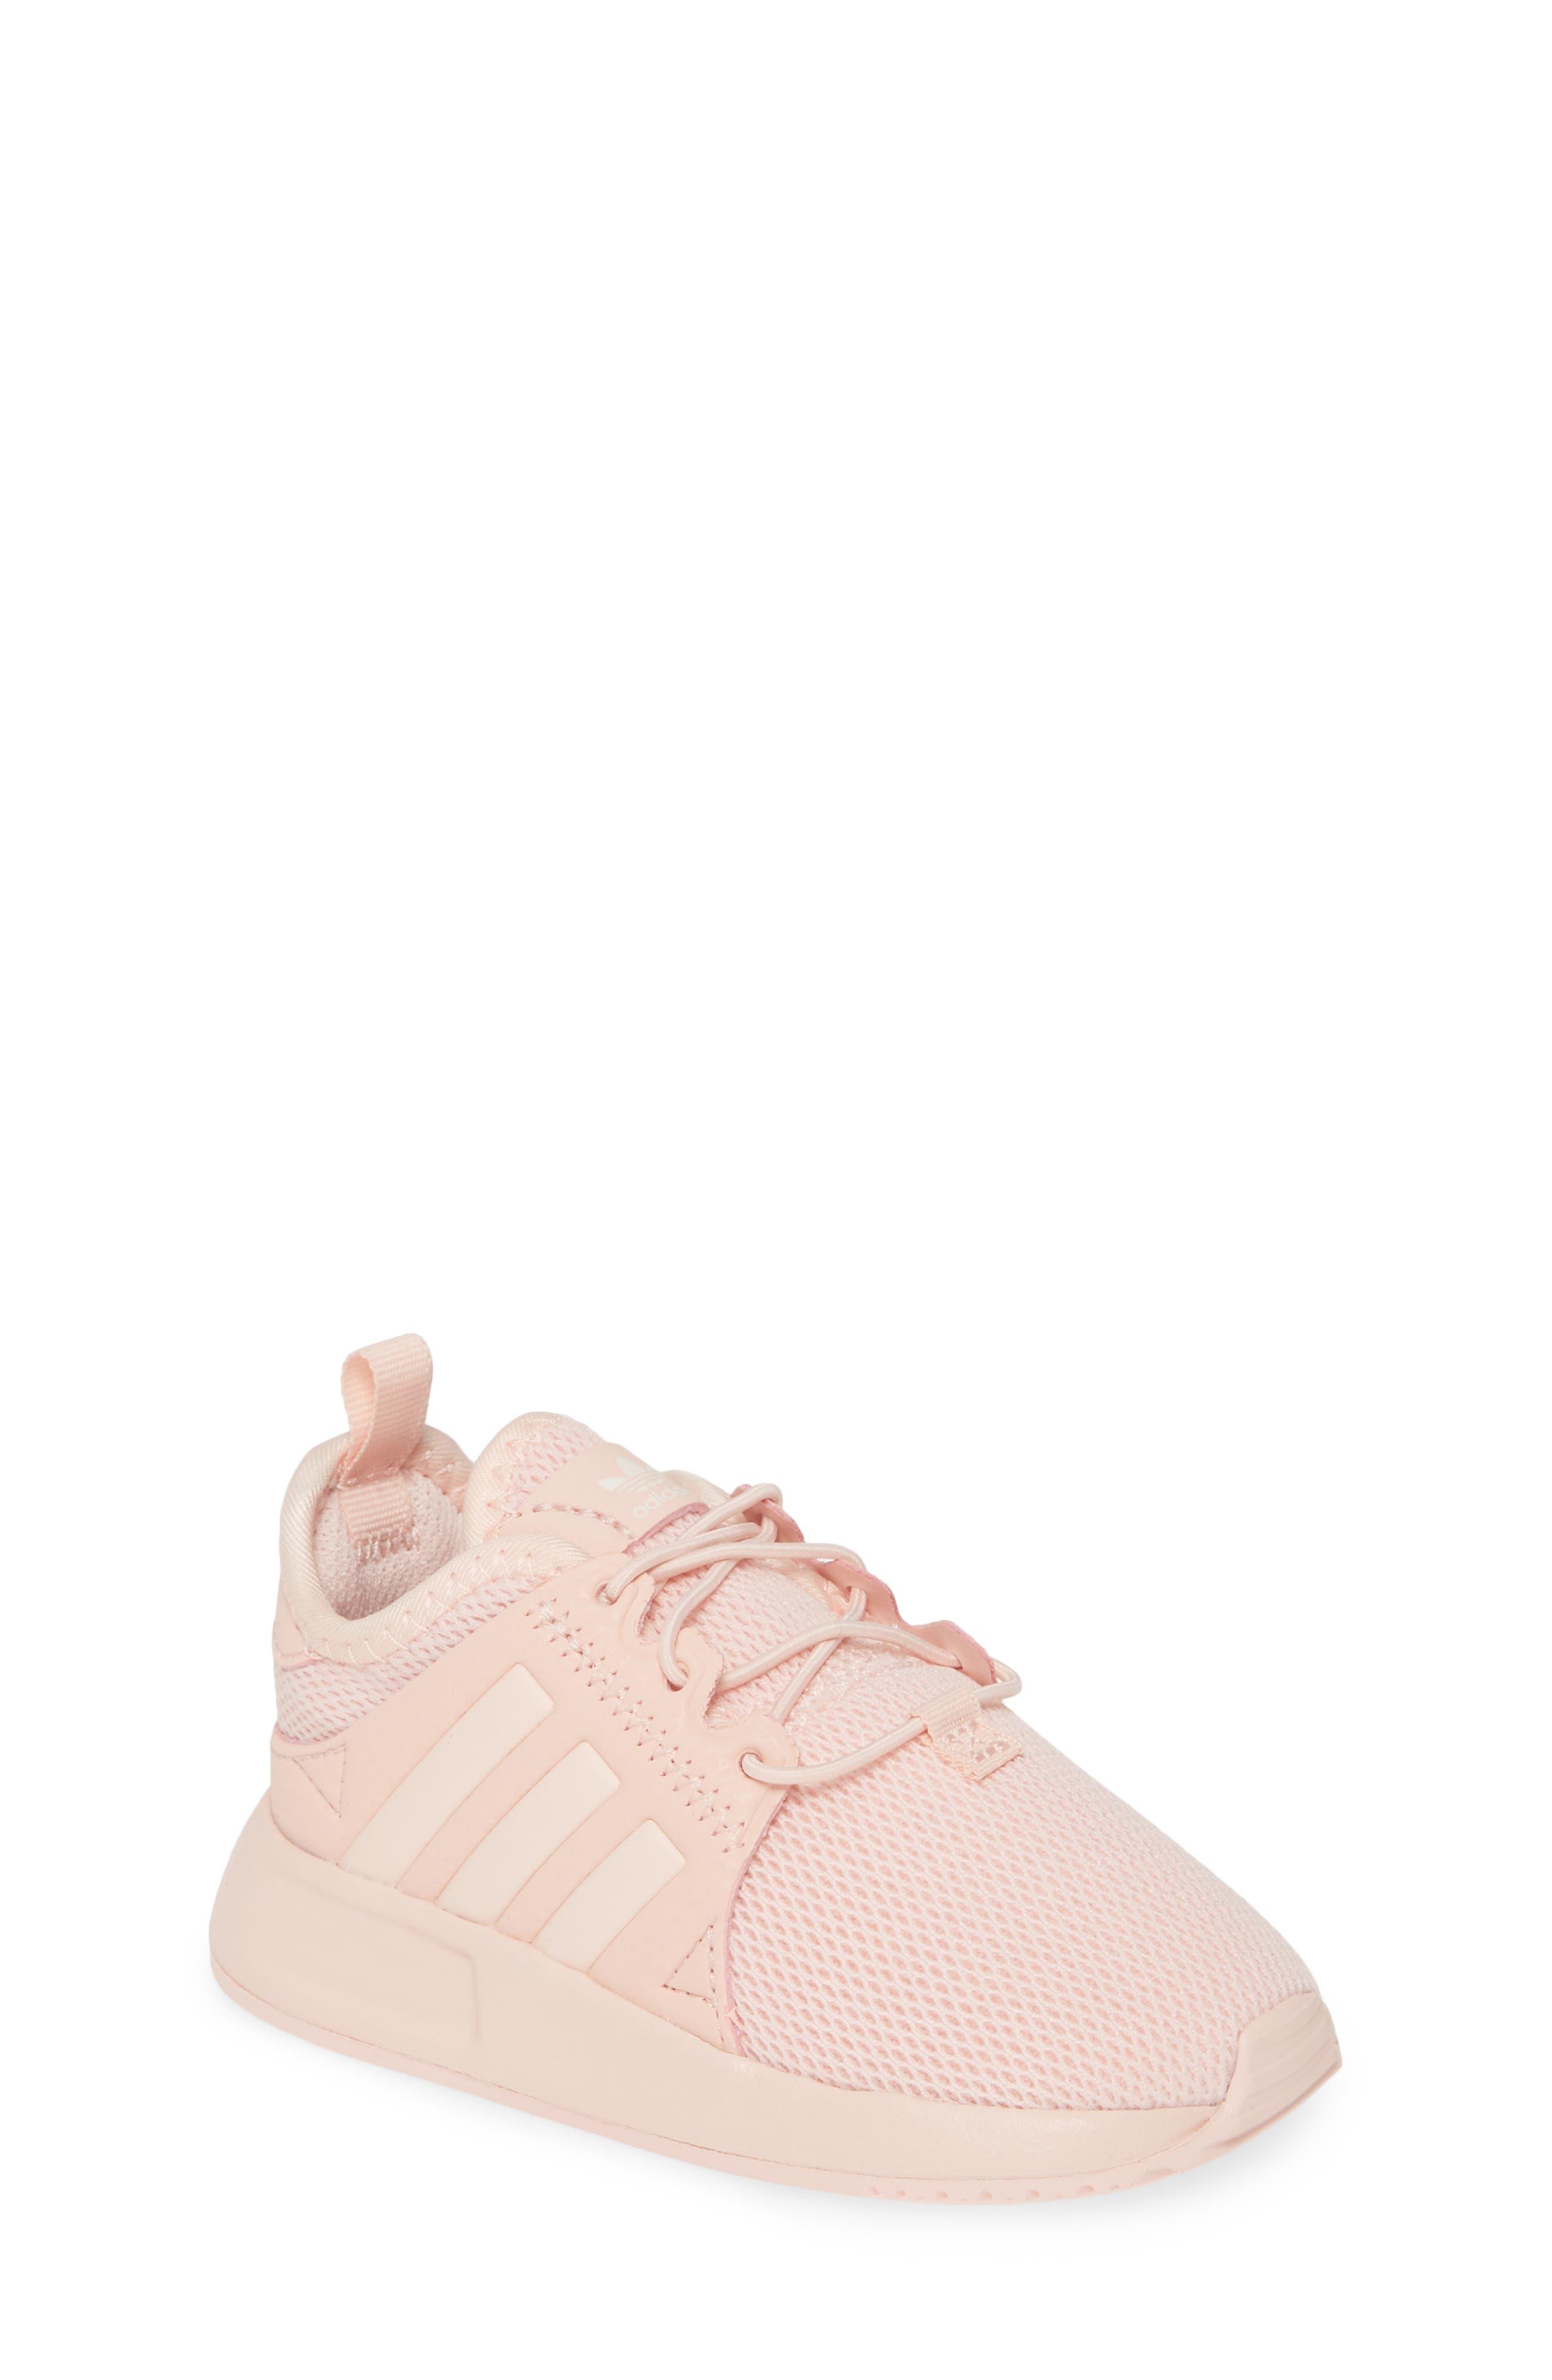 Adidas Adidas Girls' ShoesNordstrom ShoesNordstrom Adidas ShoesNordstrom Girls' Girls' ShoesNordstrom Adidas Girls' Adidas Girls' MVqSLpUzG